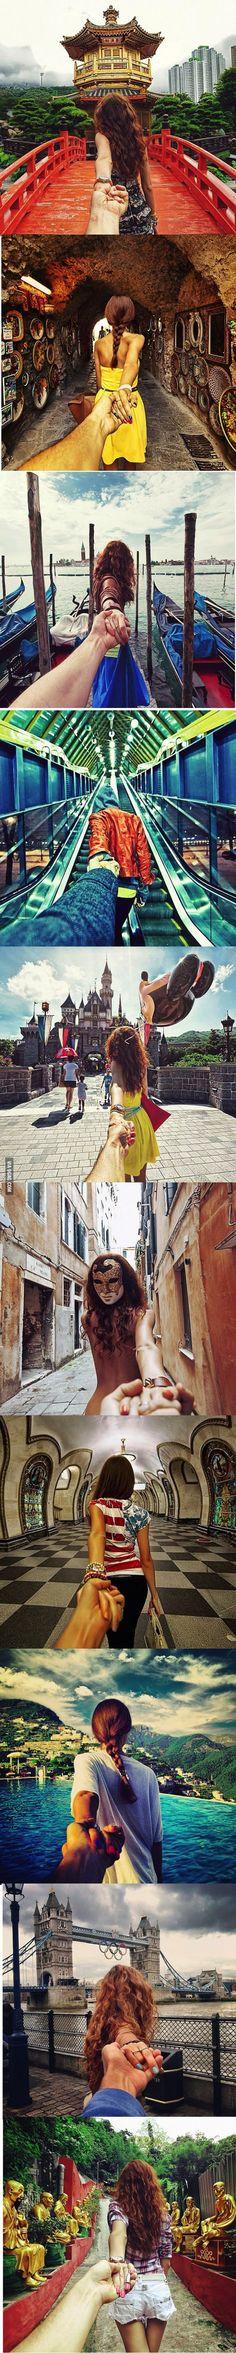 Travel : Photographer's girlfriend leads him around the world. <3